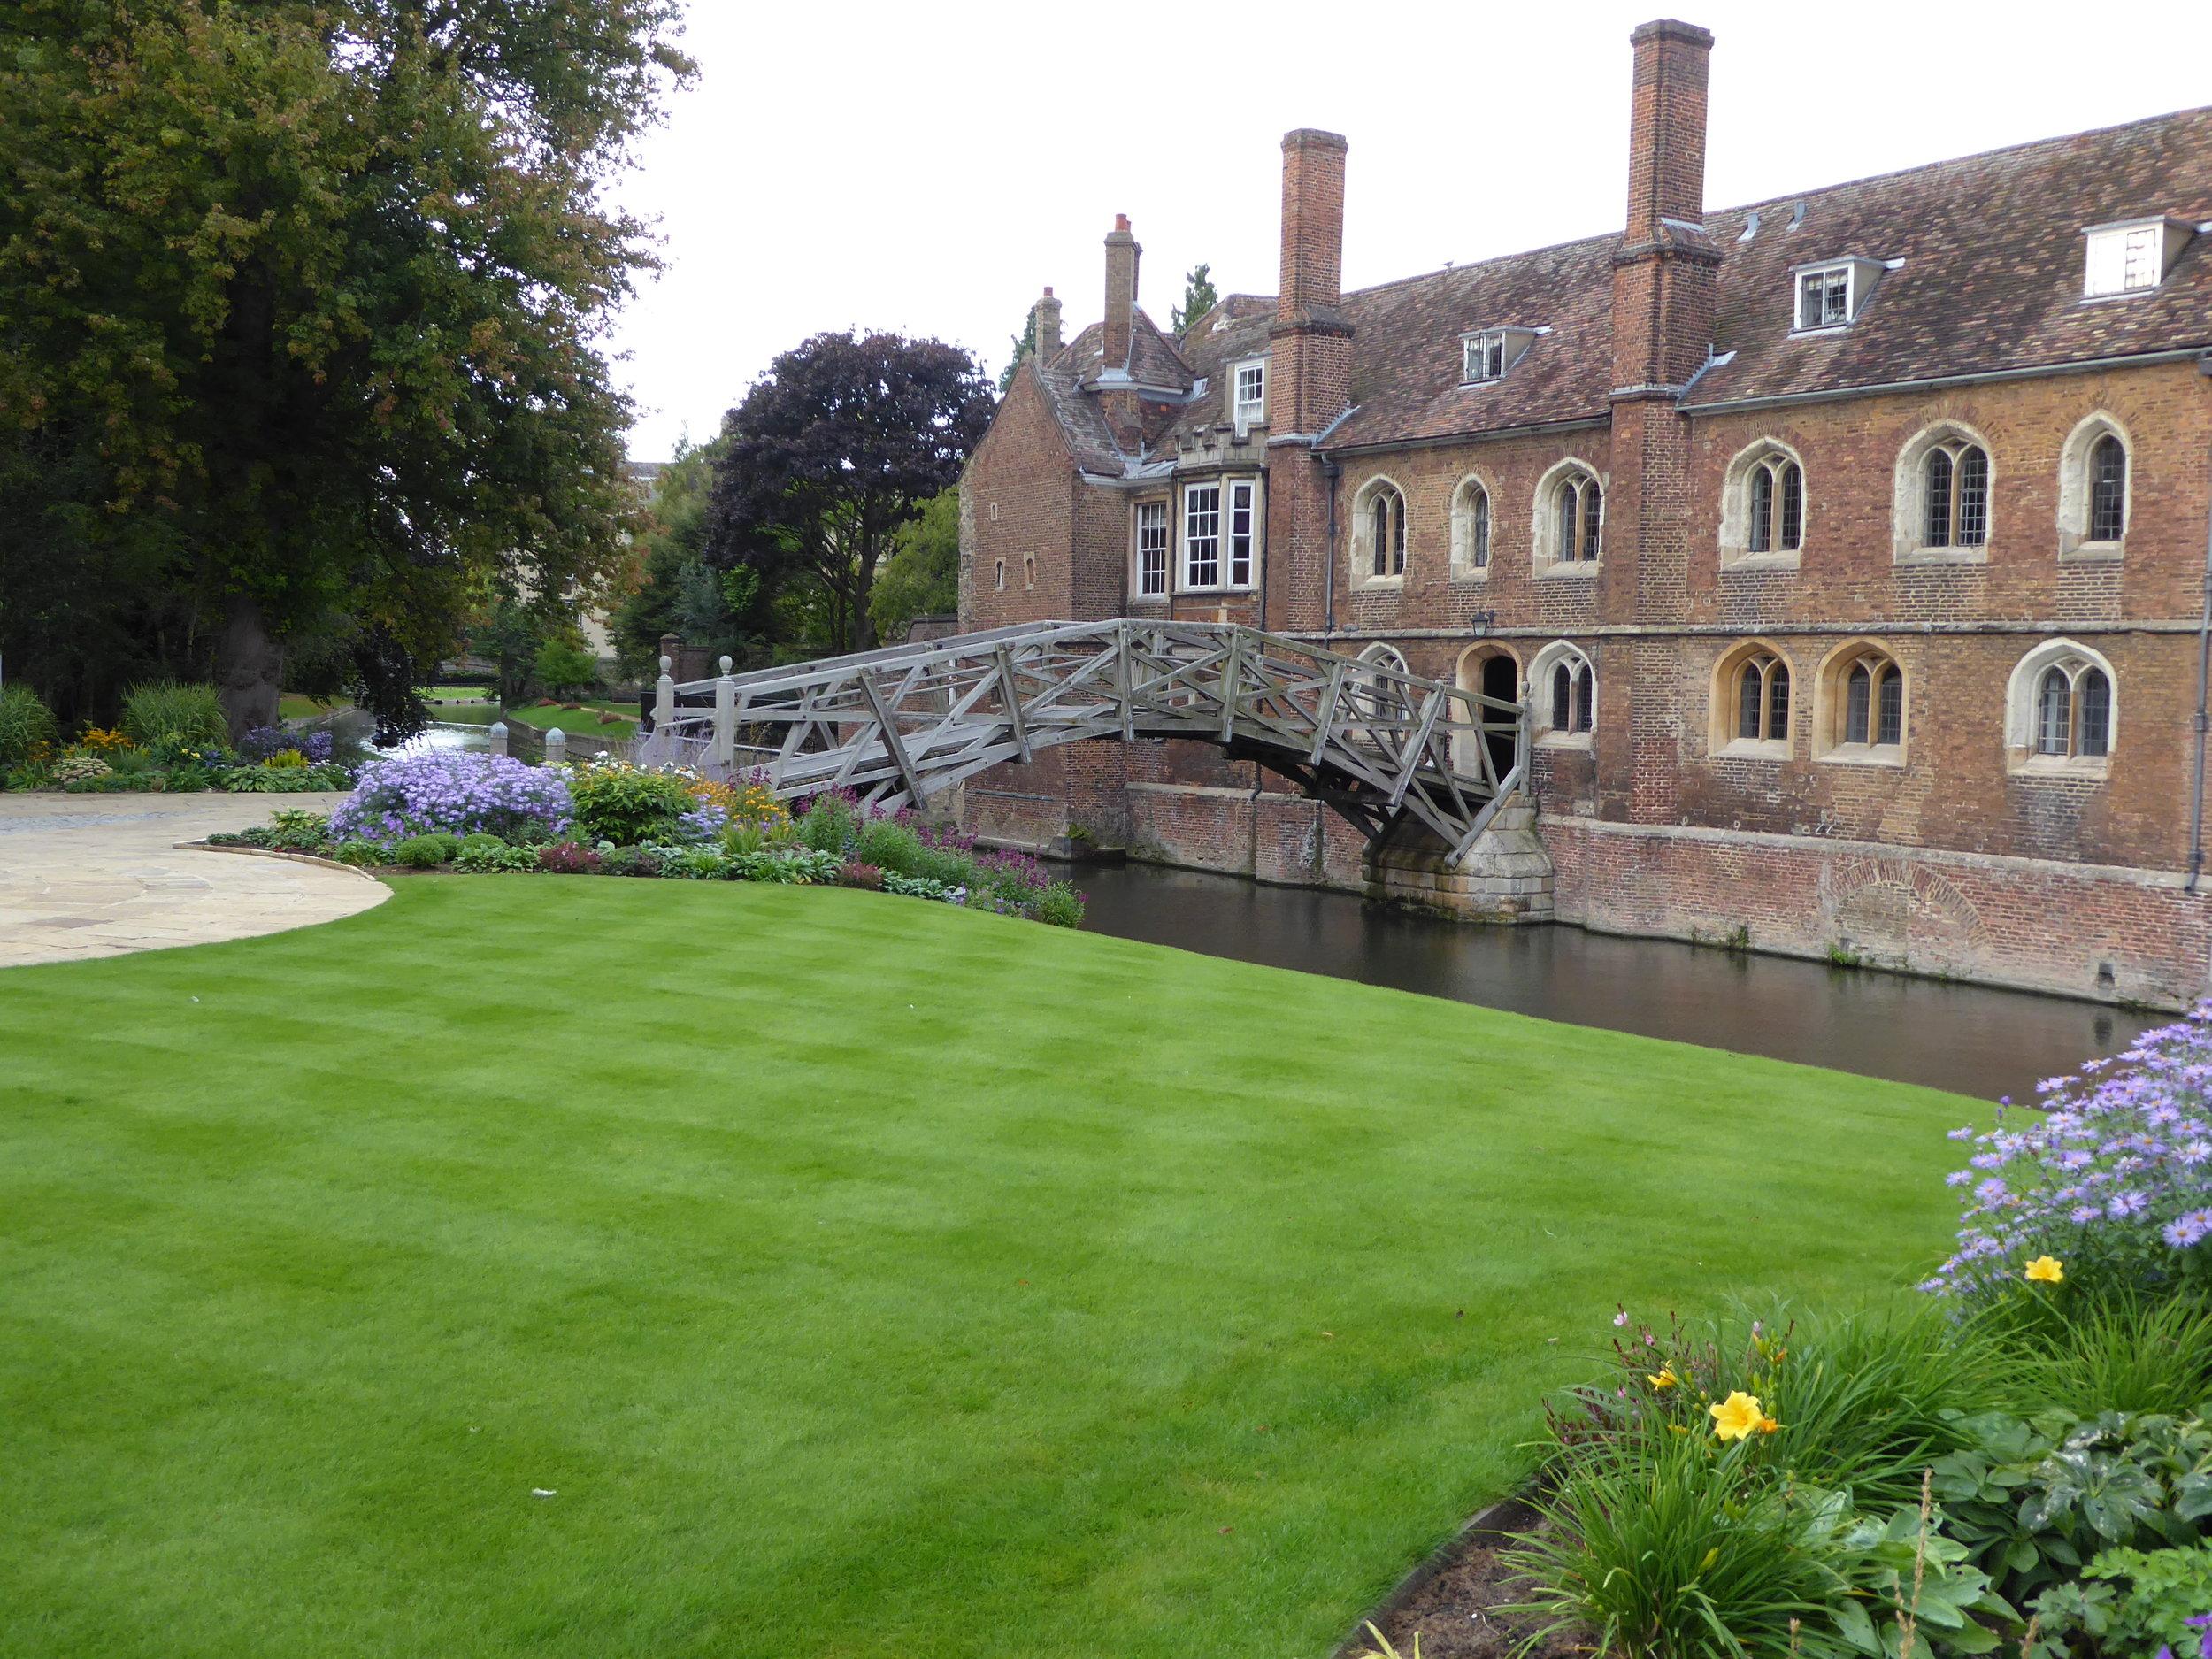 The Mathematical Bridge in Cambridge.